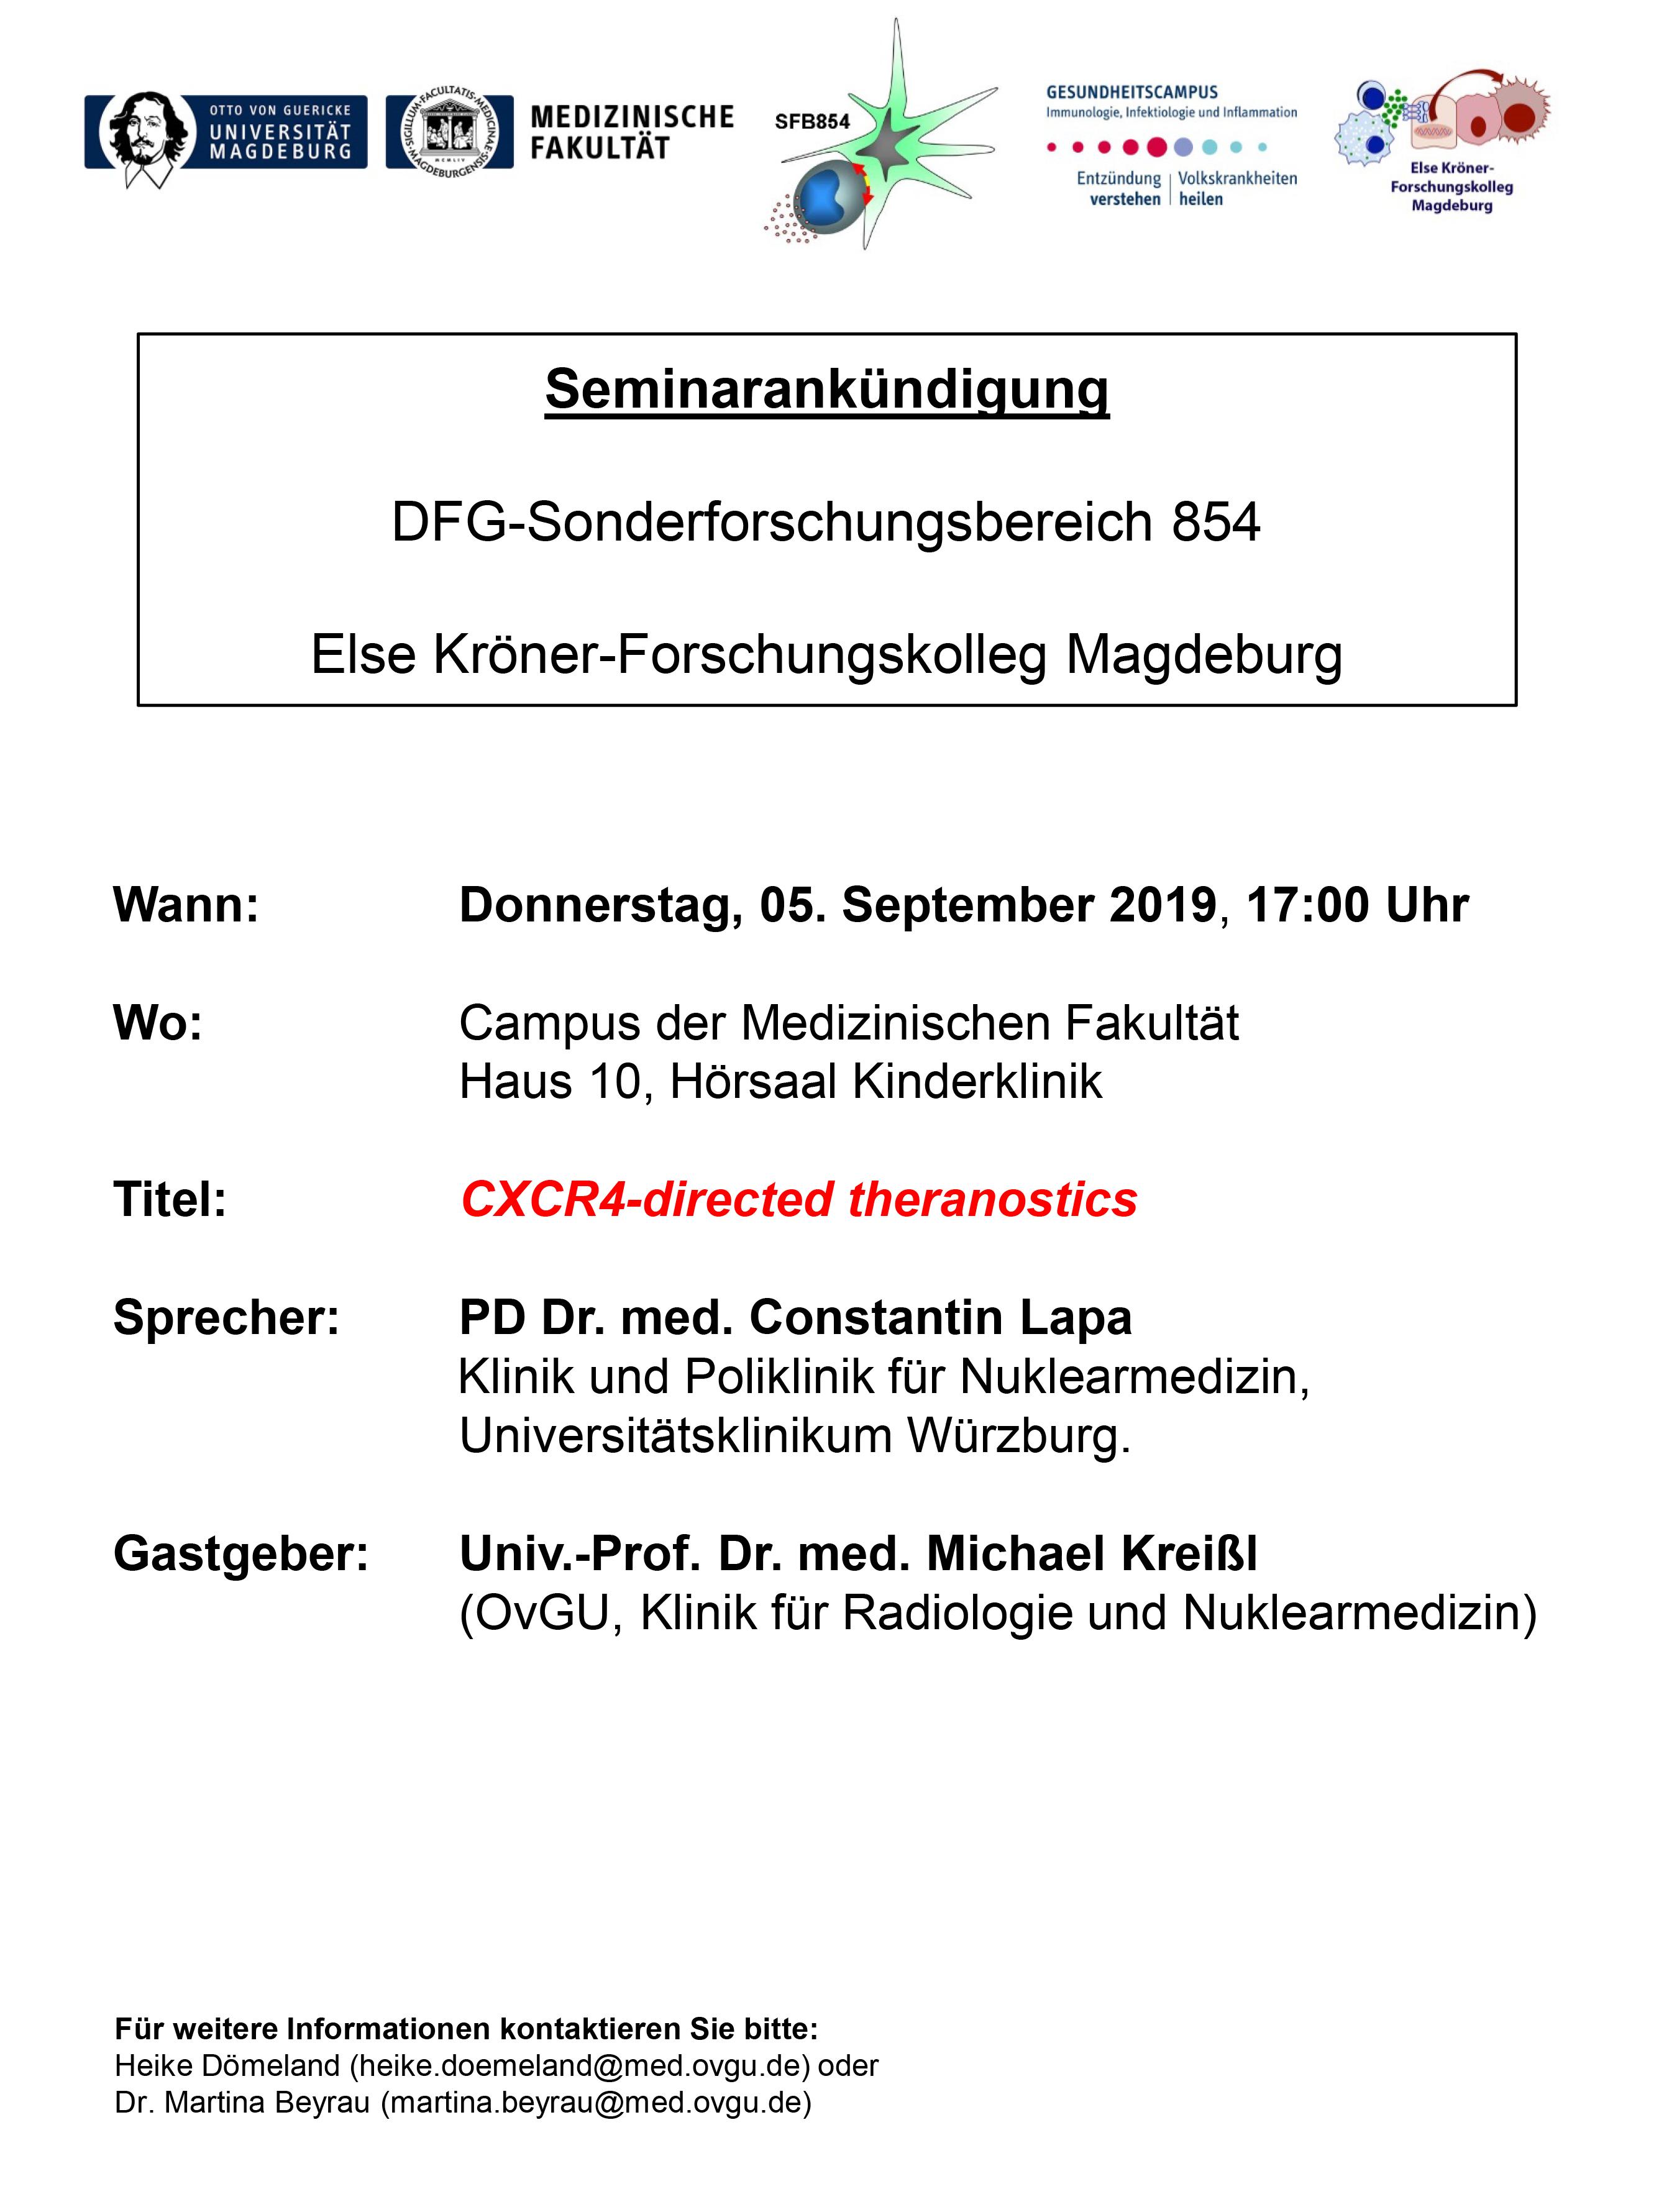 CRC 854 Seminar: CXCR4-directed theranostics @ Campus of the Medical Fakulty House 10, Hörsaal Kinderklinik